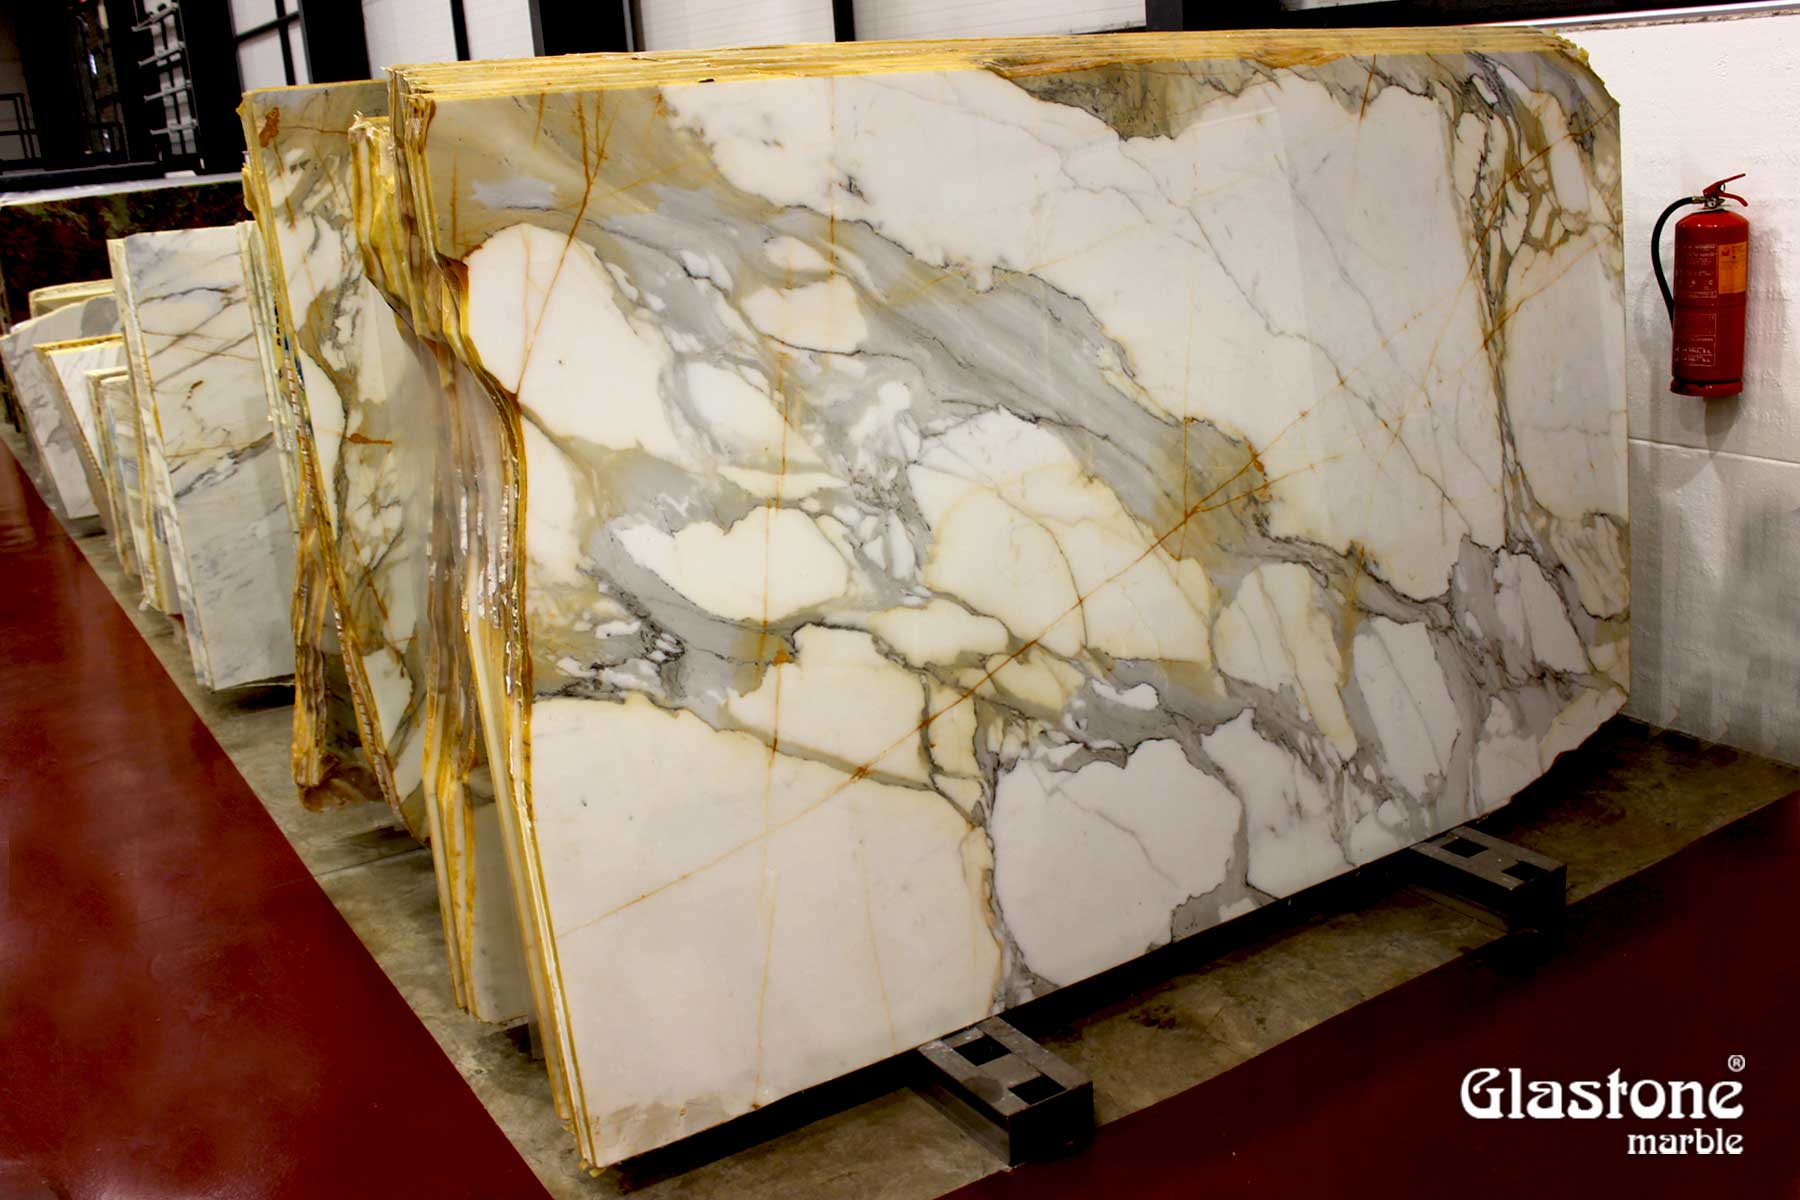 glastone marble marmol solerialaminado vidrio marmol natural calacatta borghini